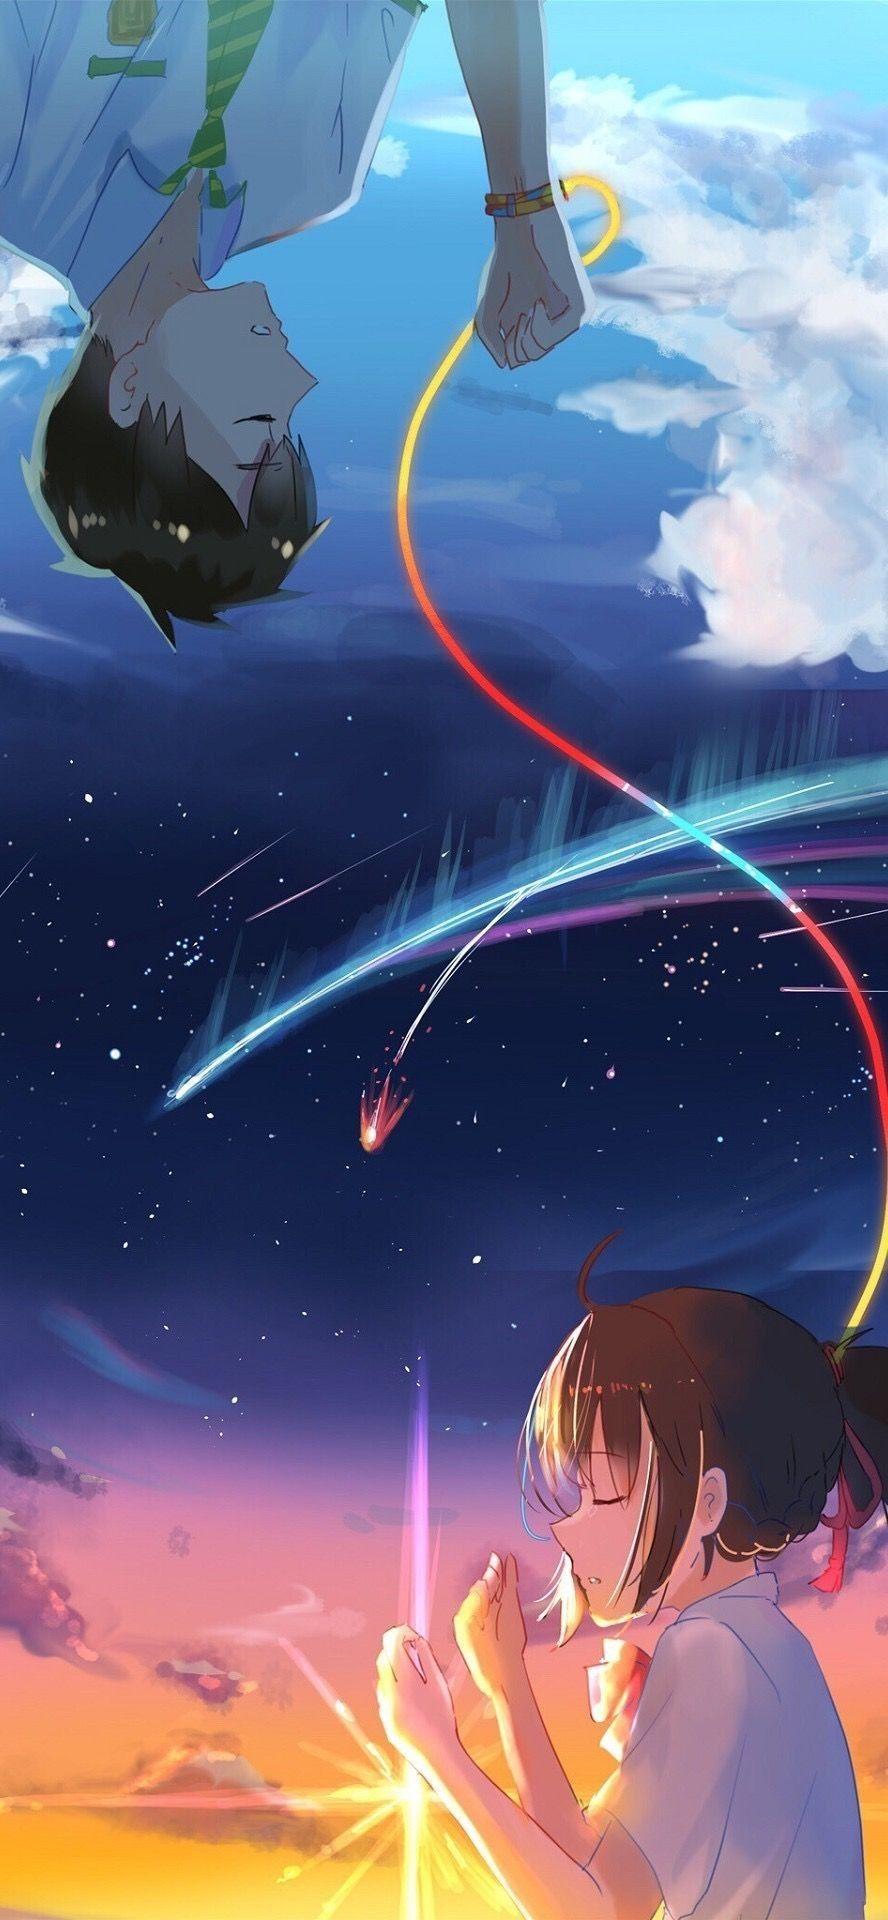 Pin By Rezu Chhetri On Your Name Your Name Anime Anime Background Anime Wallpaper